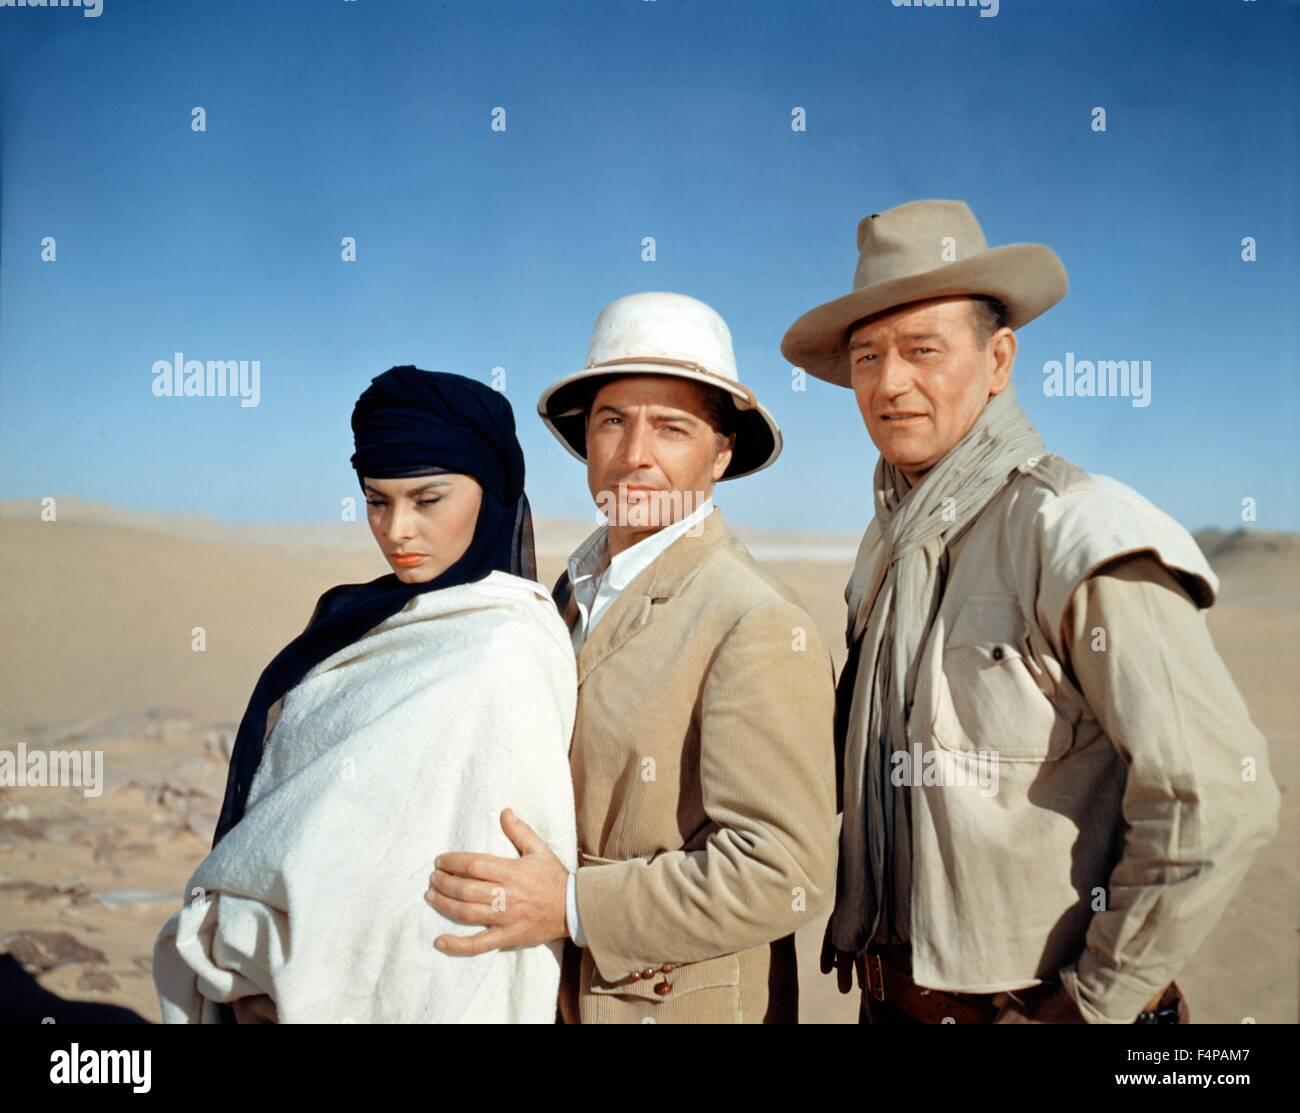 Sophia Loren, Rossano Brazzi, John Wayne / Legende verloren 1957 unter der Regie von Henry Hathaway Stockbild